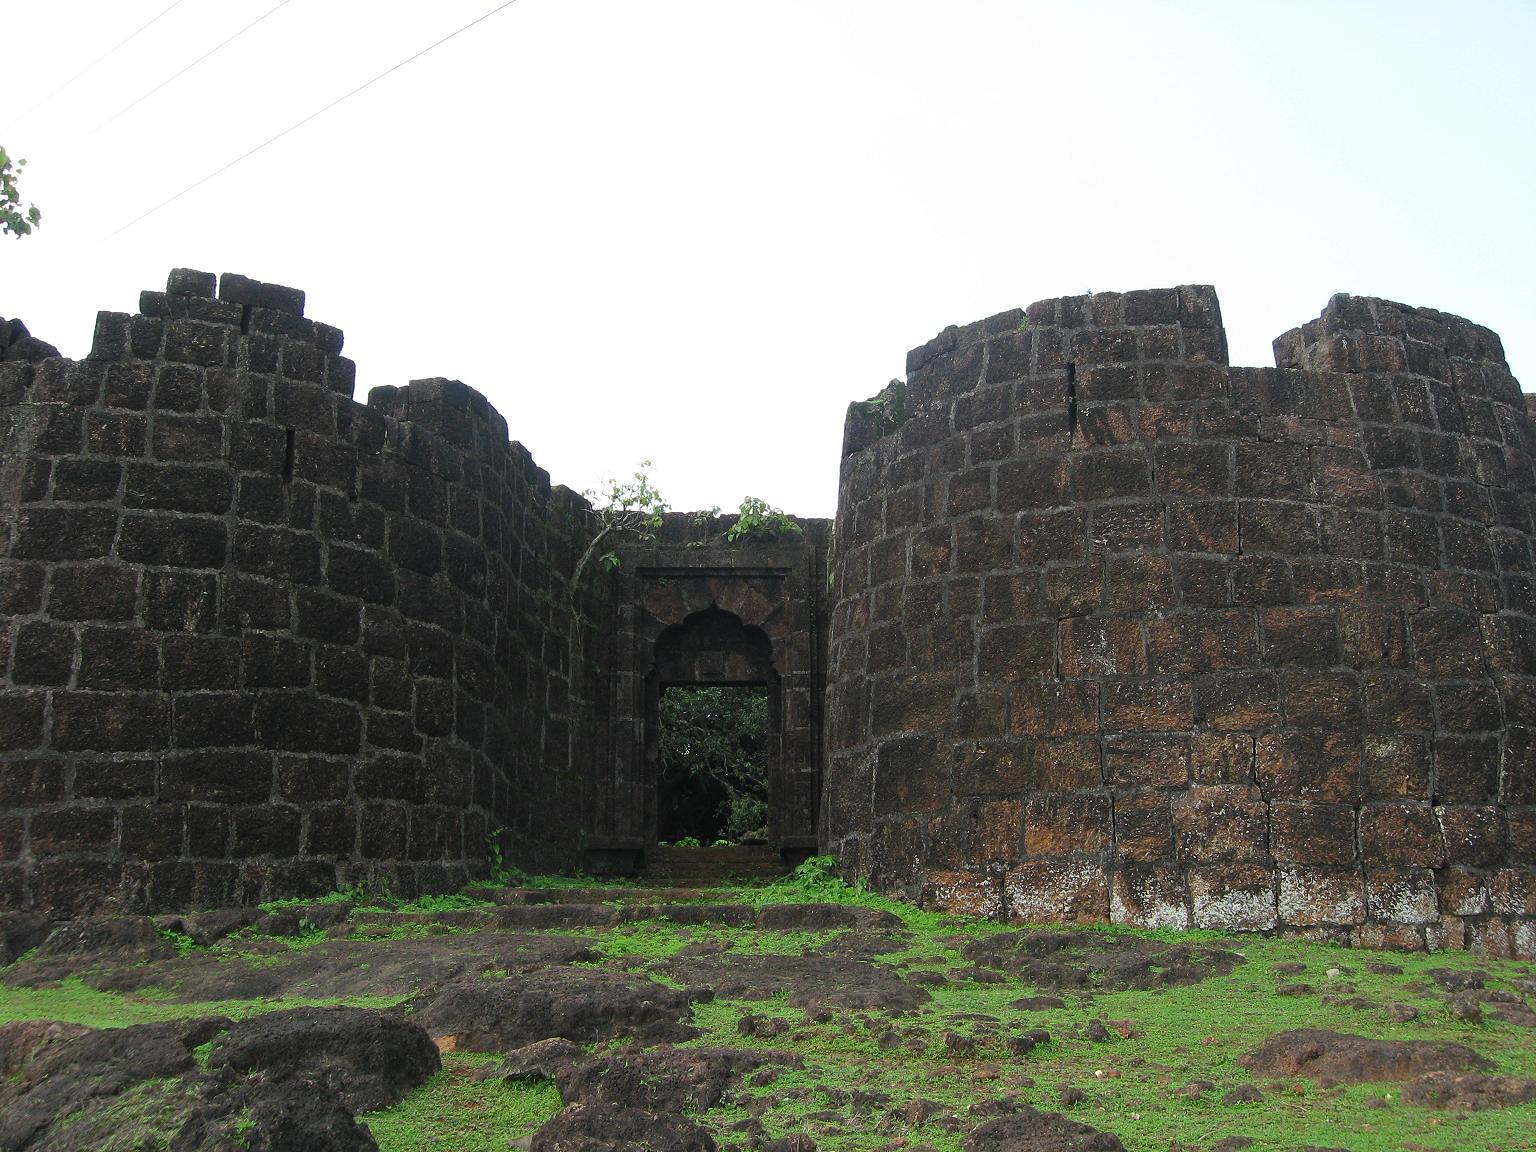 Bankot Fort - Where the Savitri River Meets the Arabian Sea